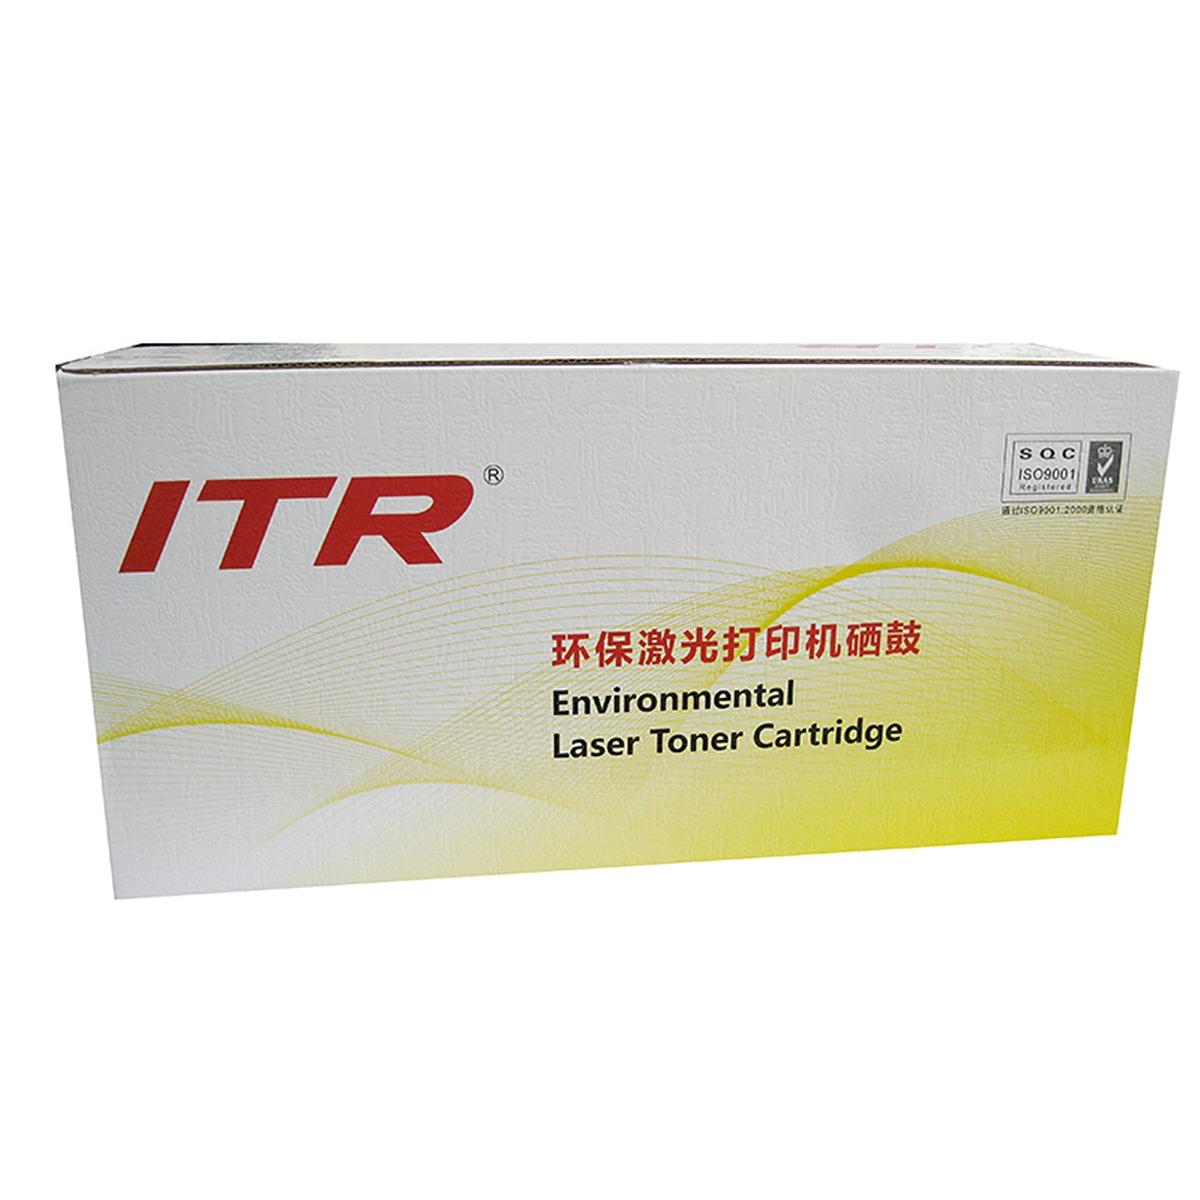 ITR-CN0494 兼容墨盒 (单位:盒) (适用于:EPSONSTYLUSPHOTOR210/R230/R310/RX510/RX630/R350)